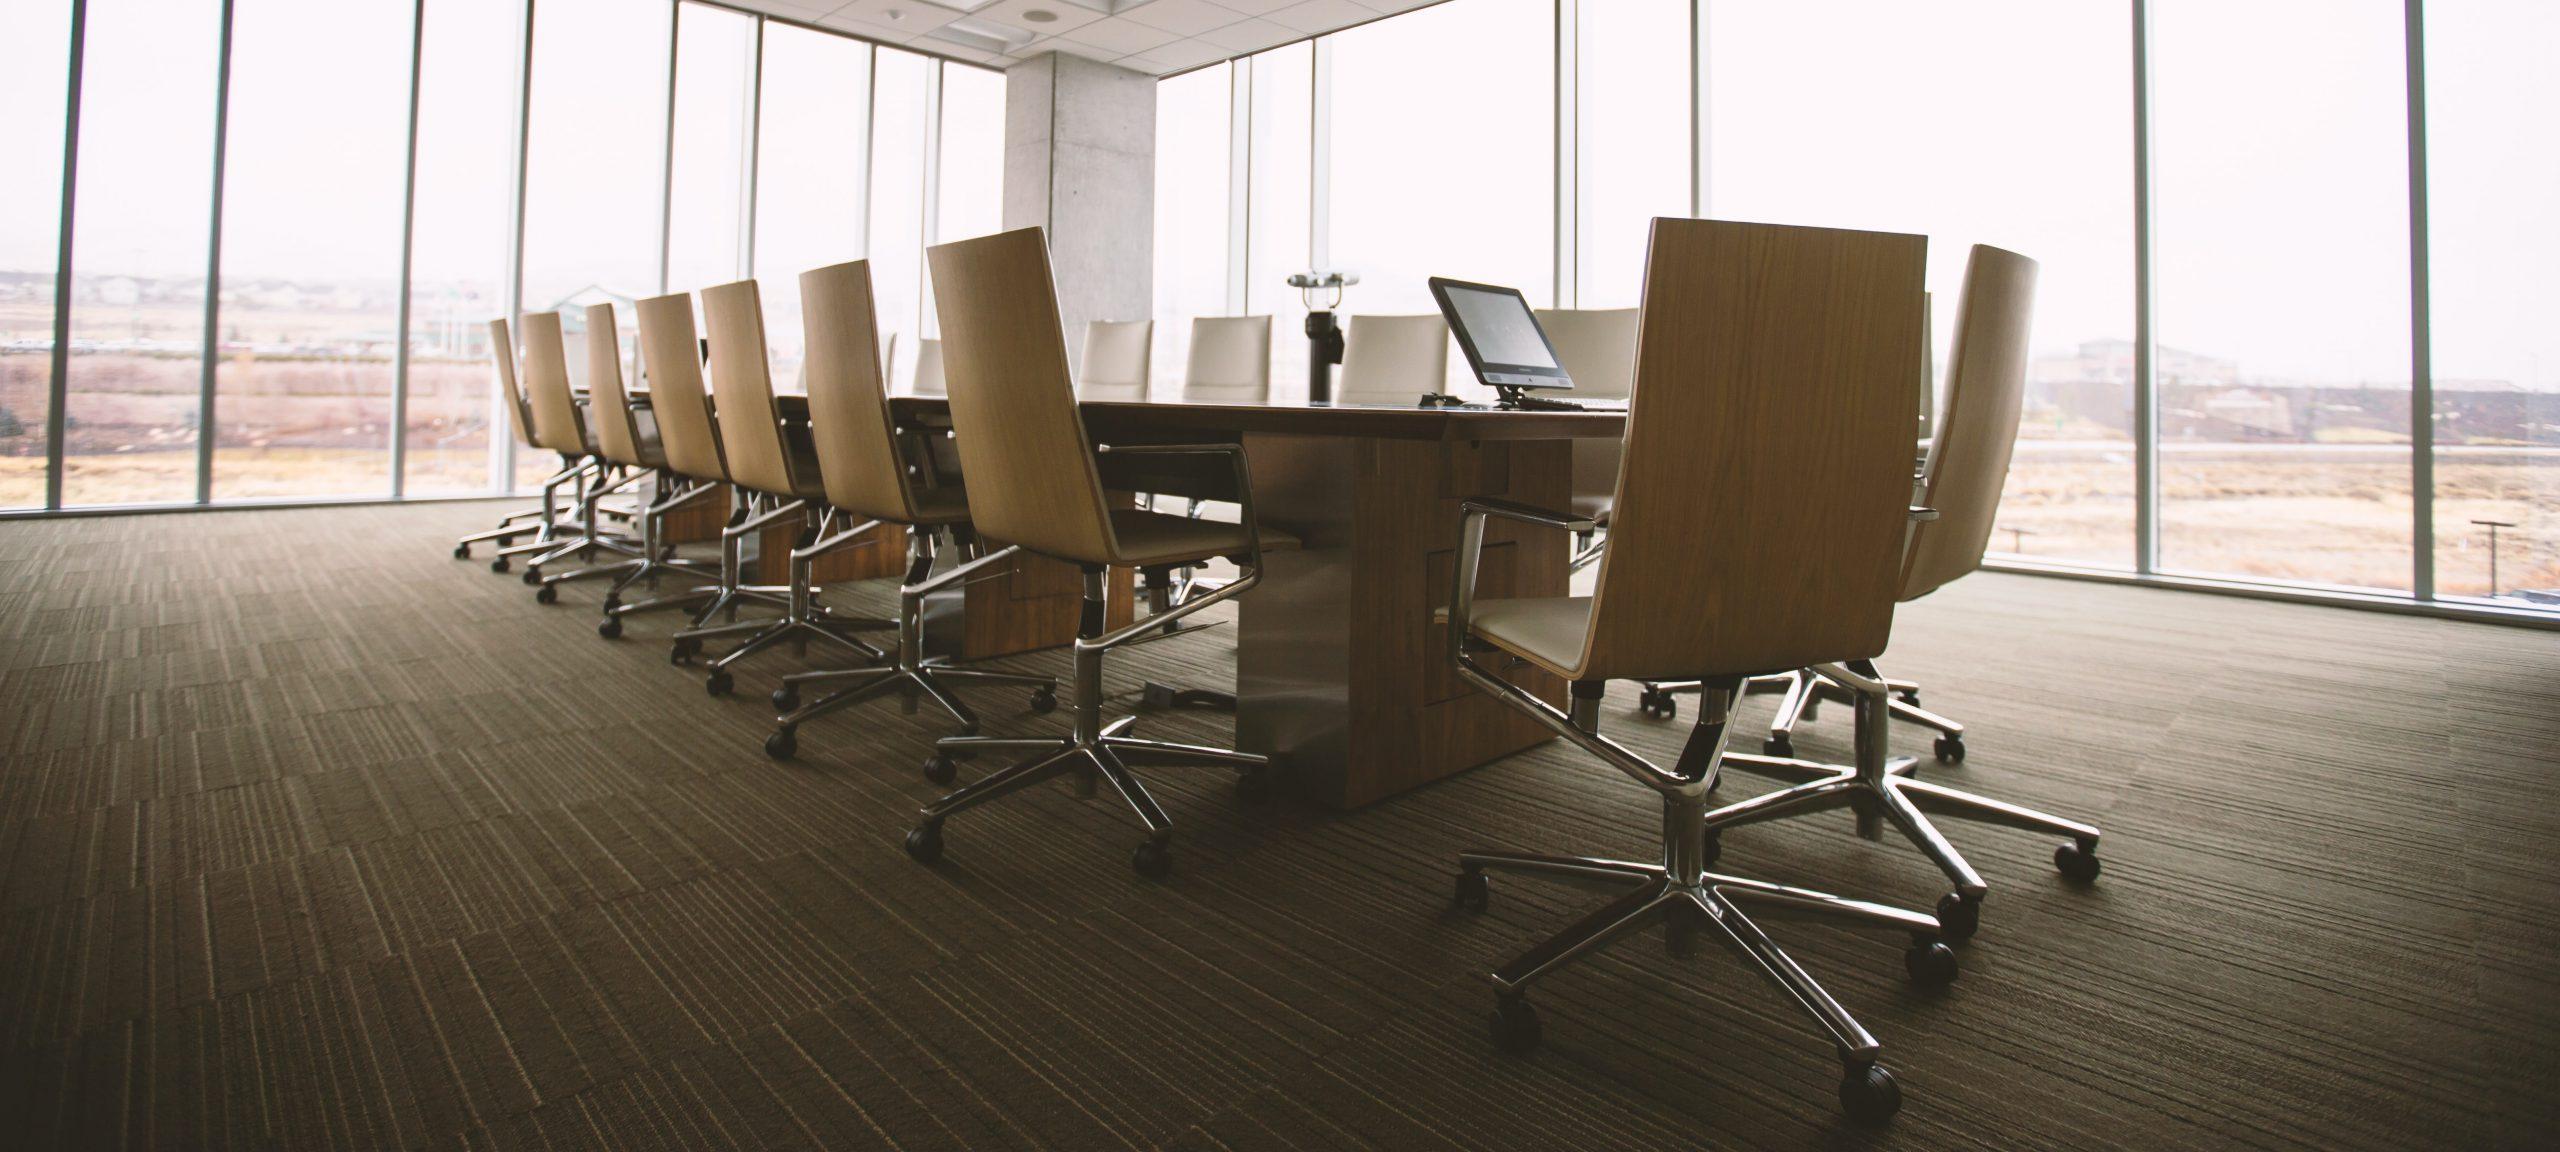 Delt Shared Services Our Board Header Image